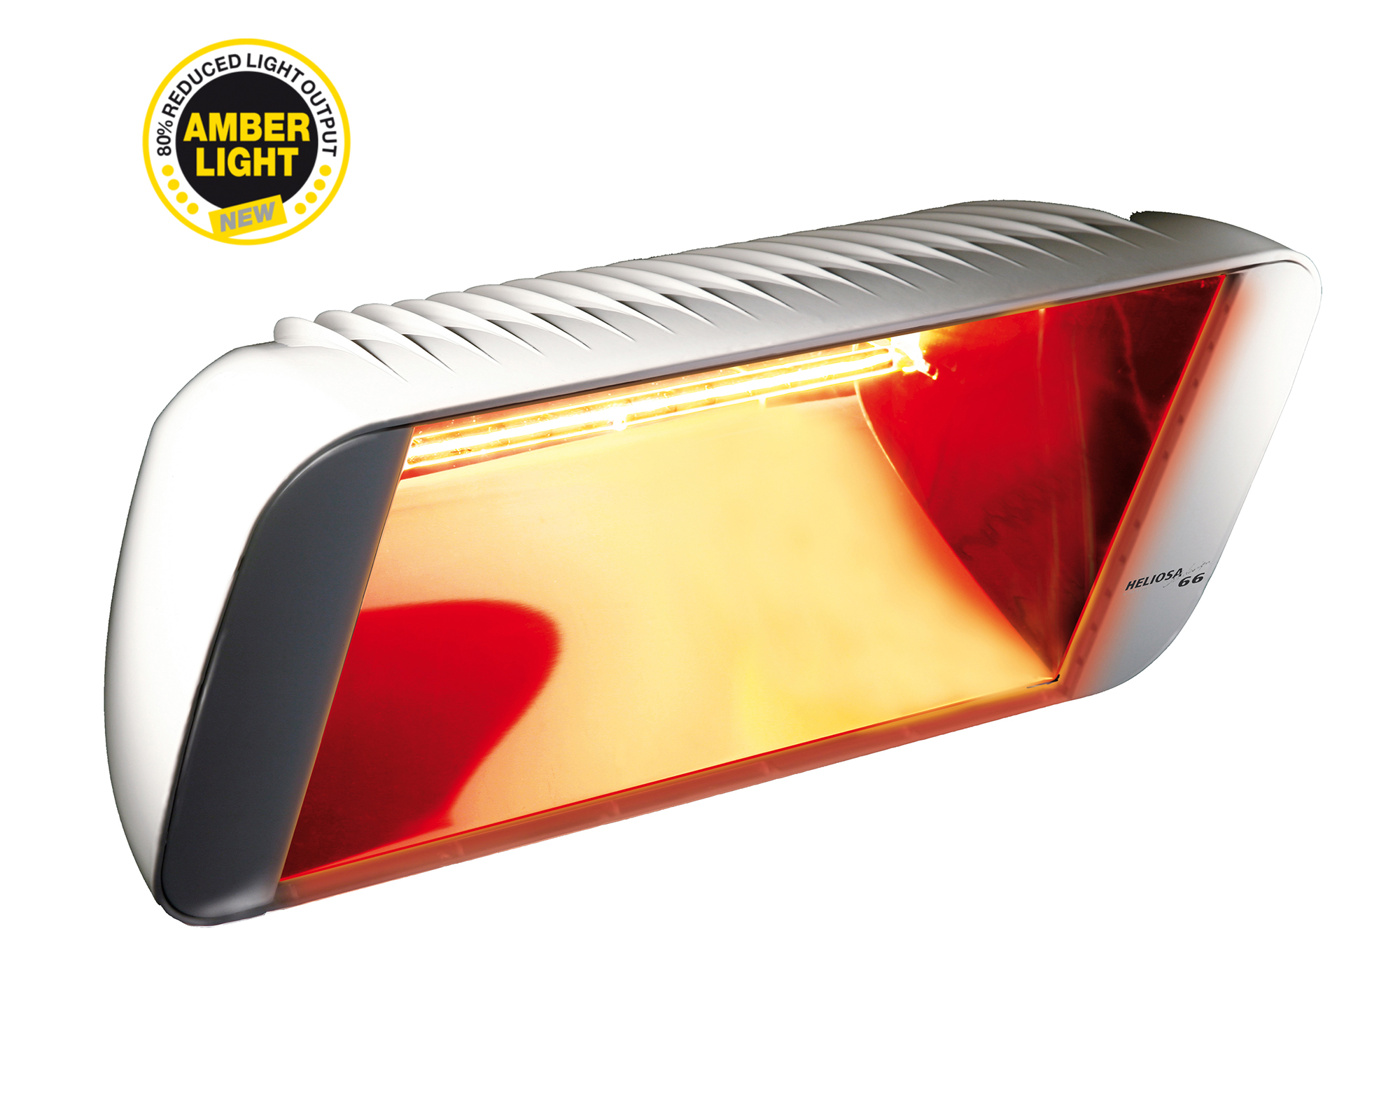 HELIOSA 66  Amber Light